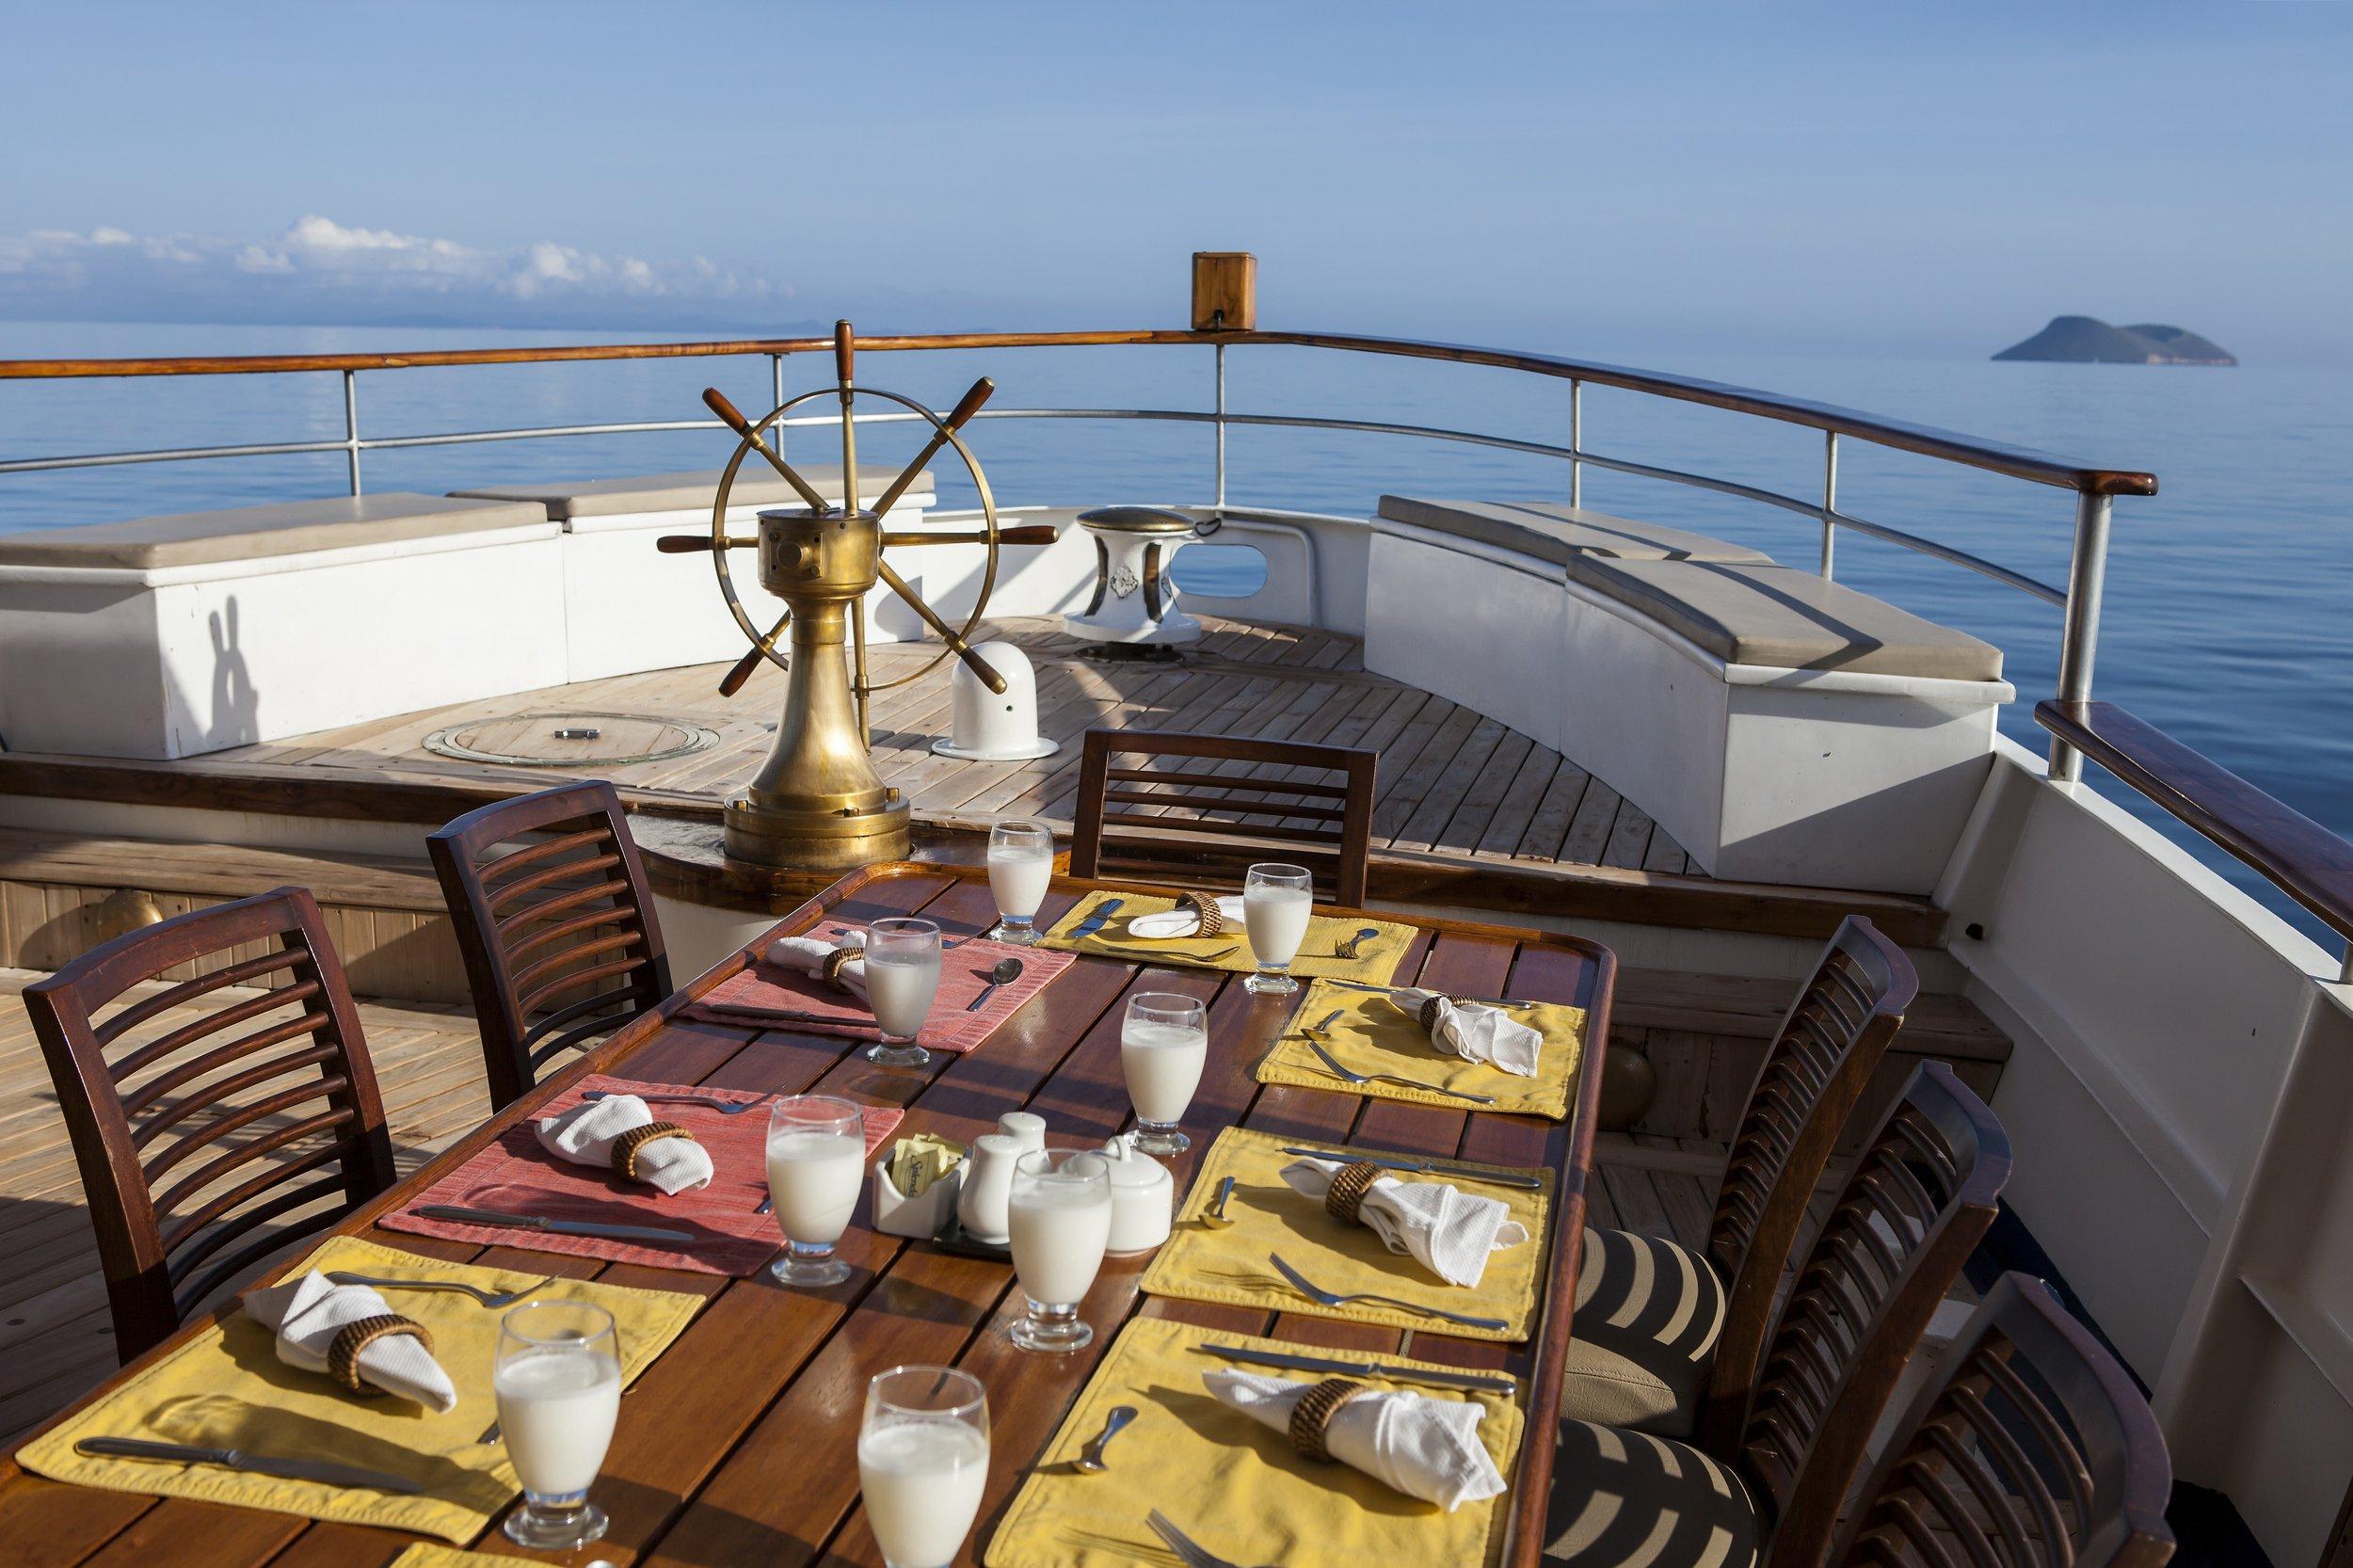 Wanderlust-travel-blog-Galapagos-islands-boat-tour